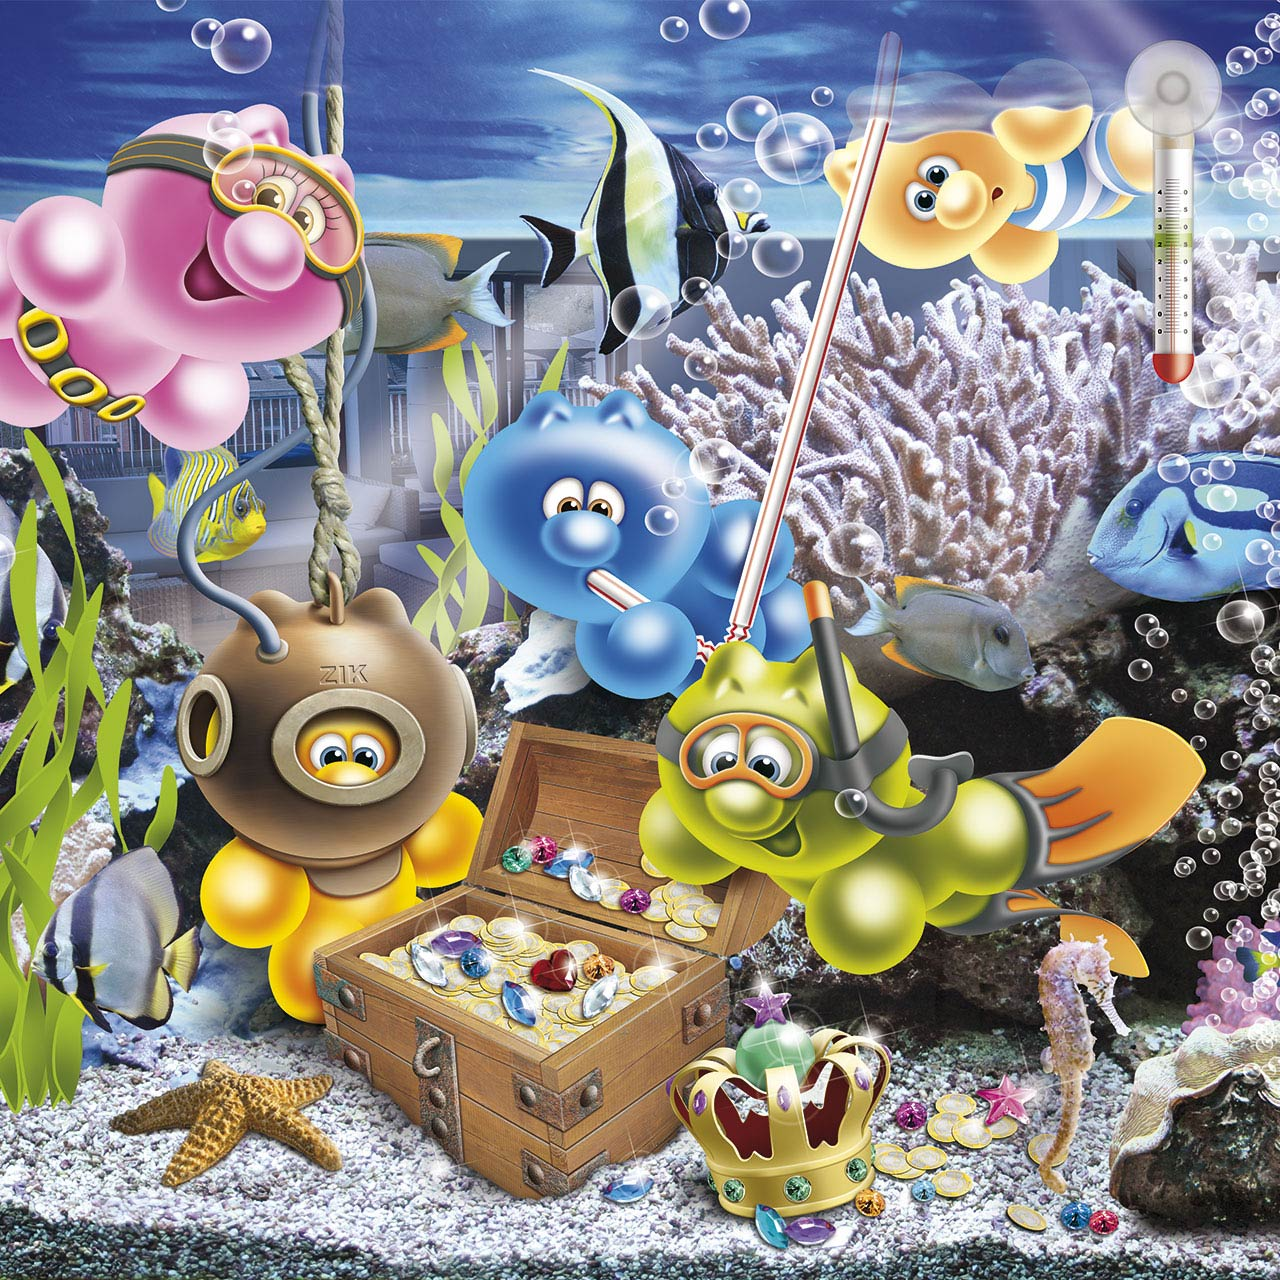 gelini character fishtank